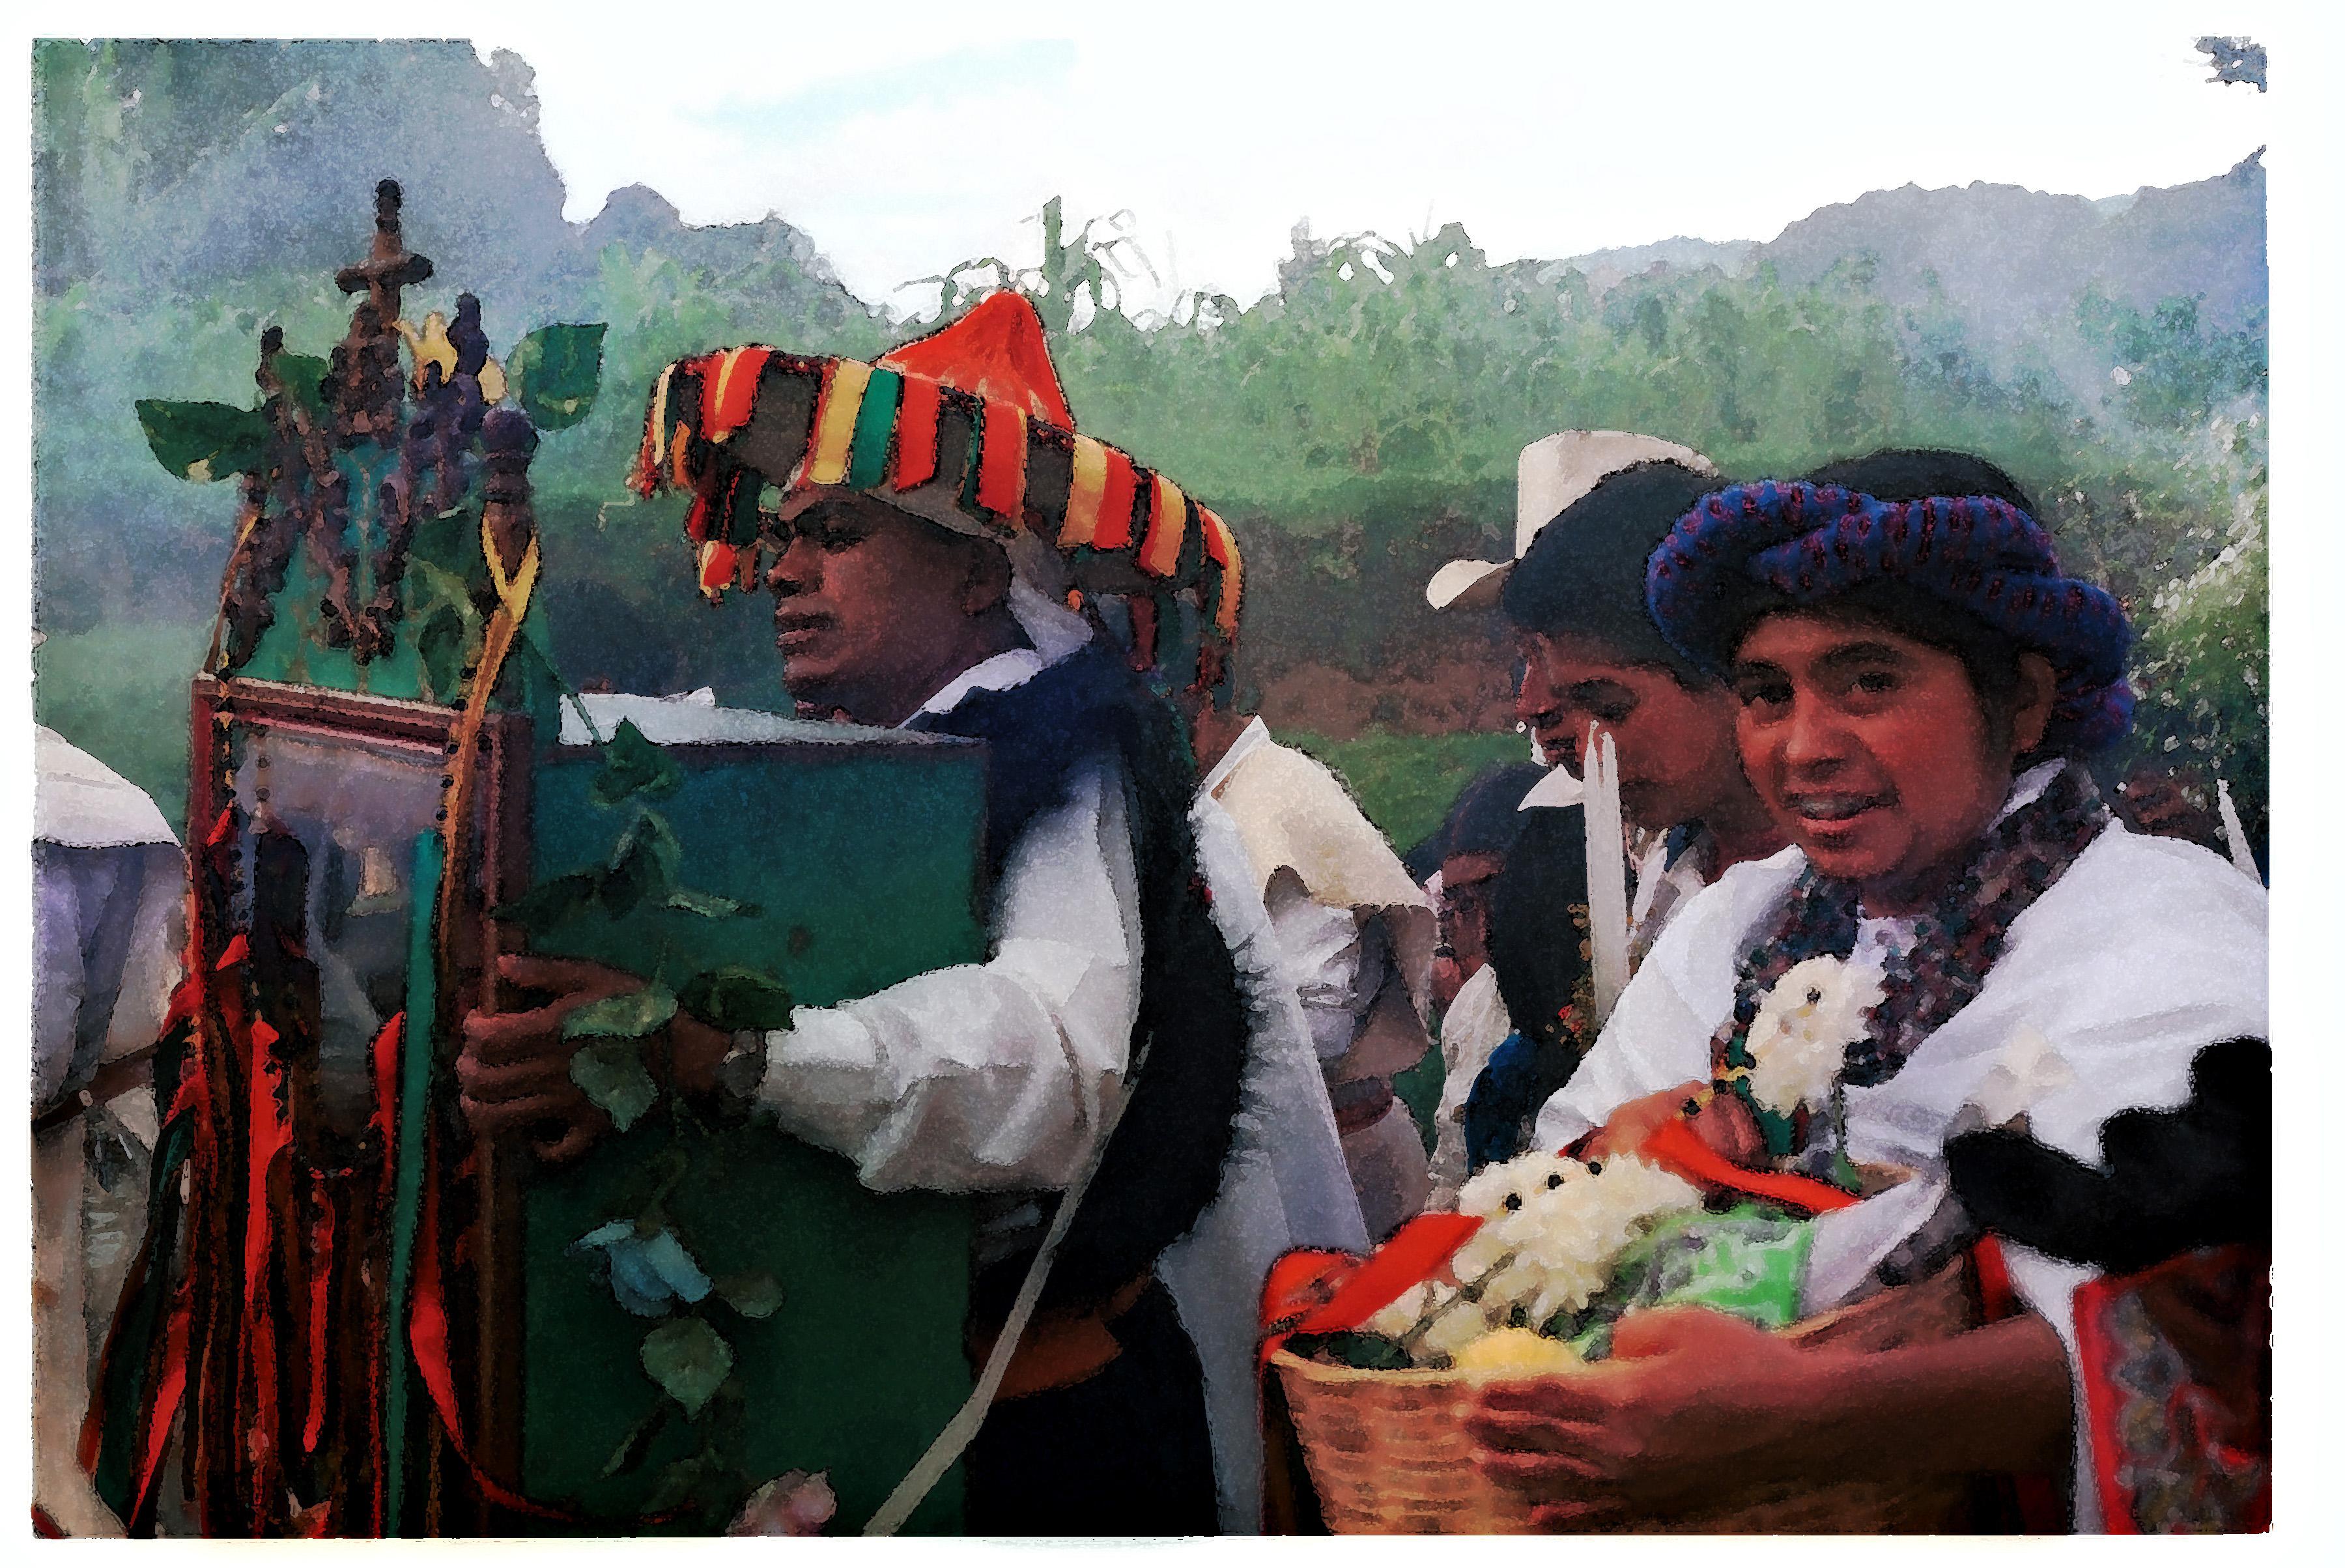 Cargo Geronimo y XunKa, 1995